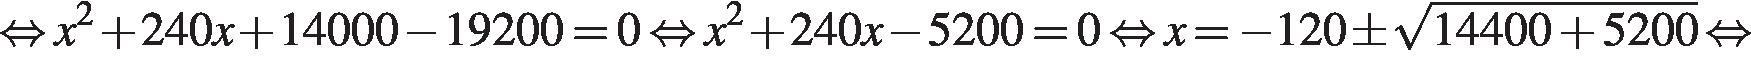 http://reshuege.ru/formula/09/090f6c3baa6abcb1257196cae75ae9d8p.png